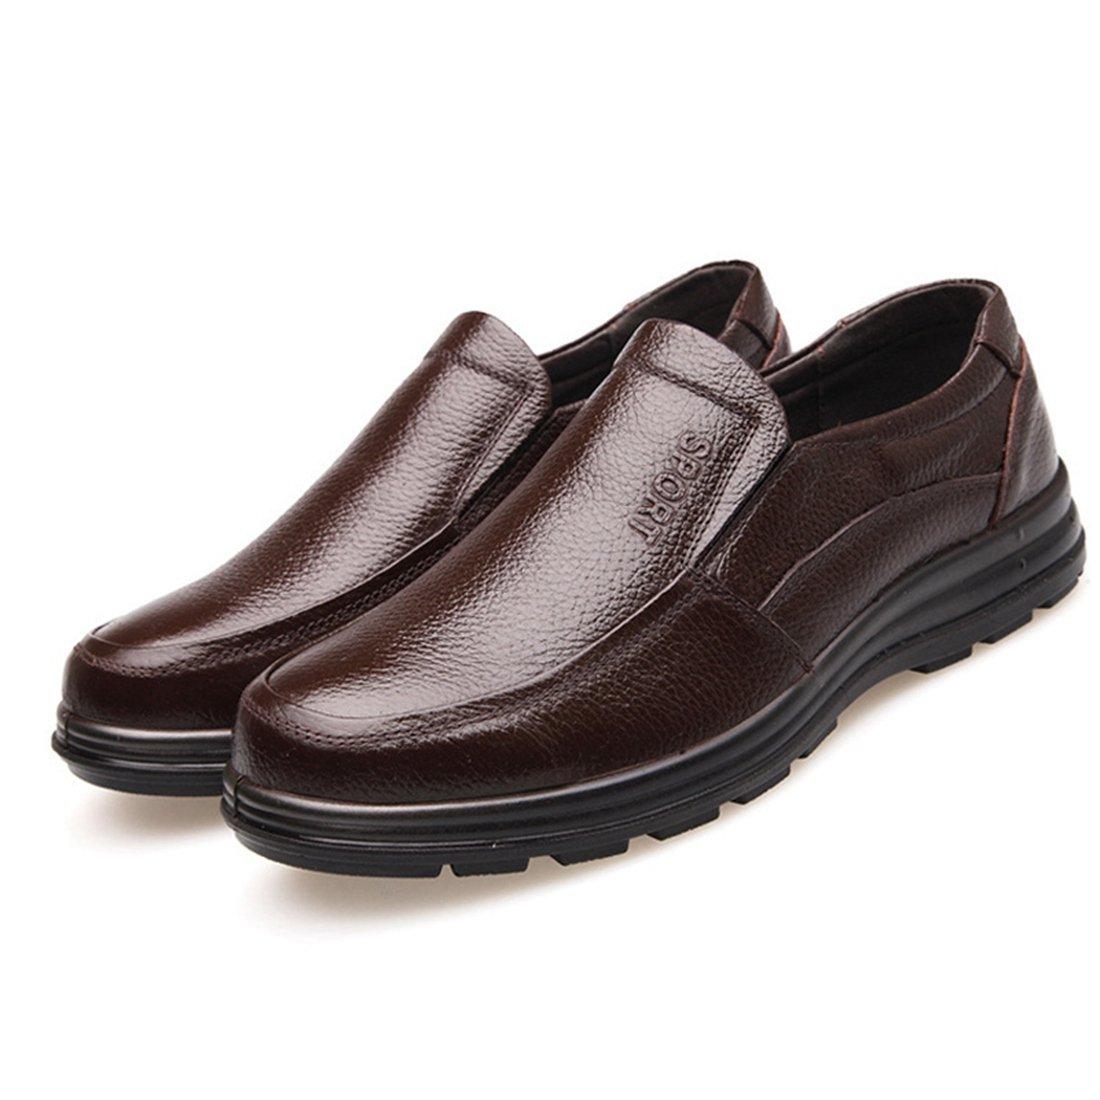 Jiyaru Mens Work Shoes Durable Restaurant Kitchen Chef Flats Business Shoe Brown US 9.5